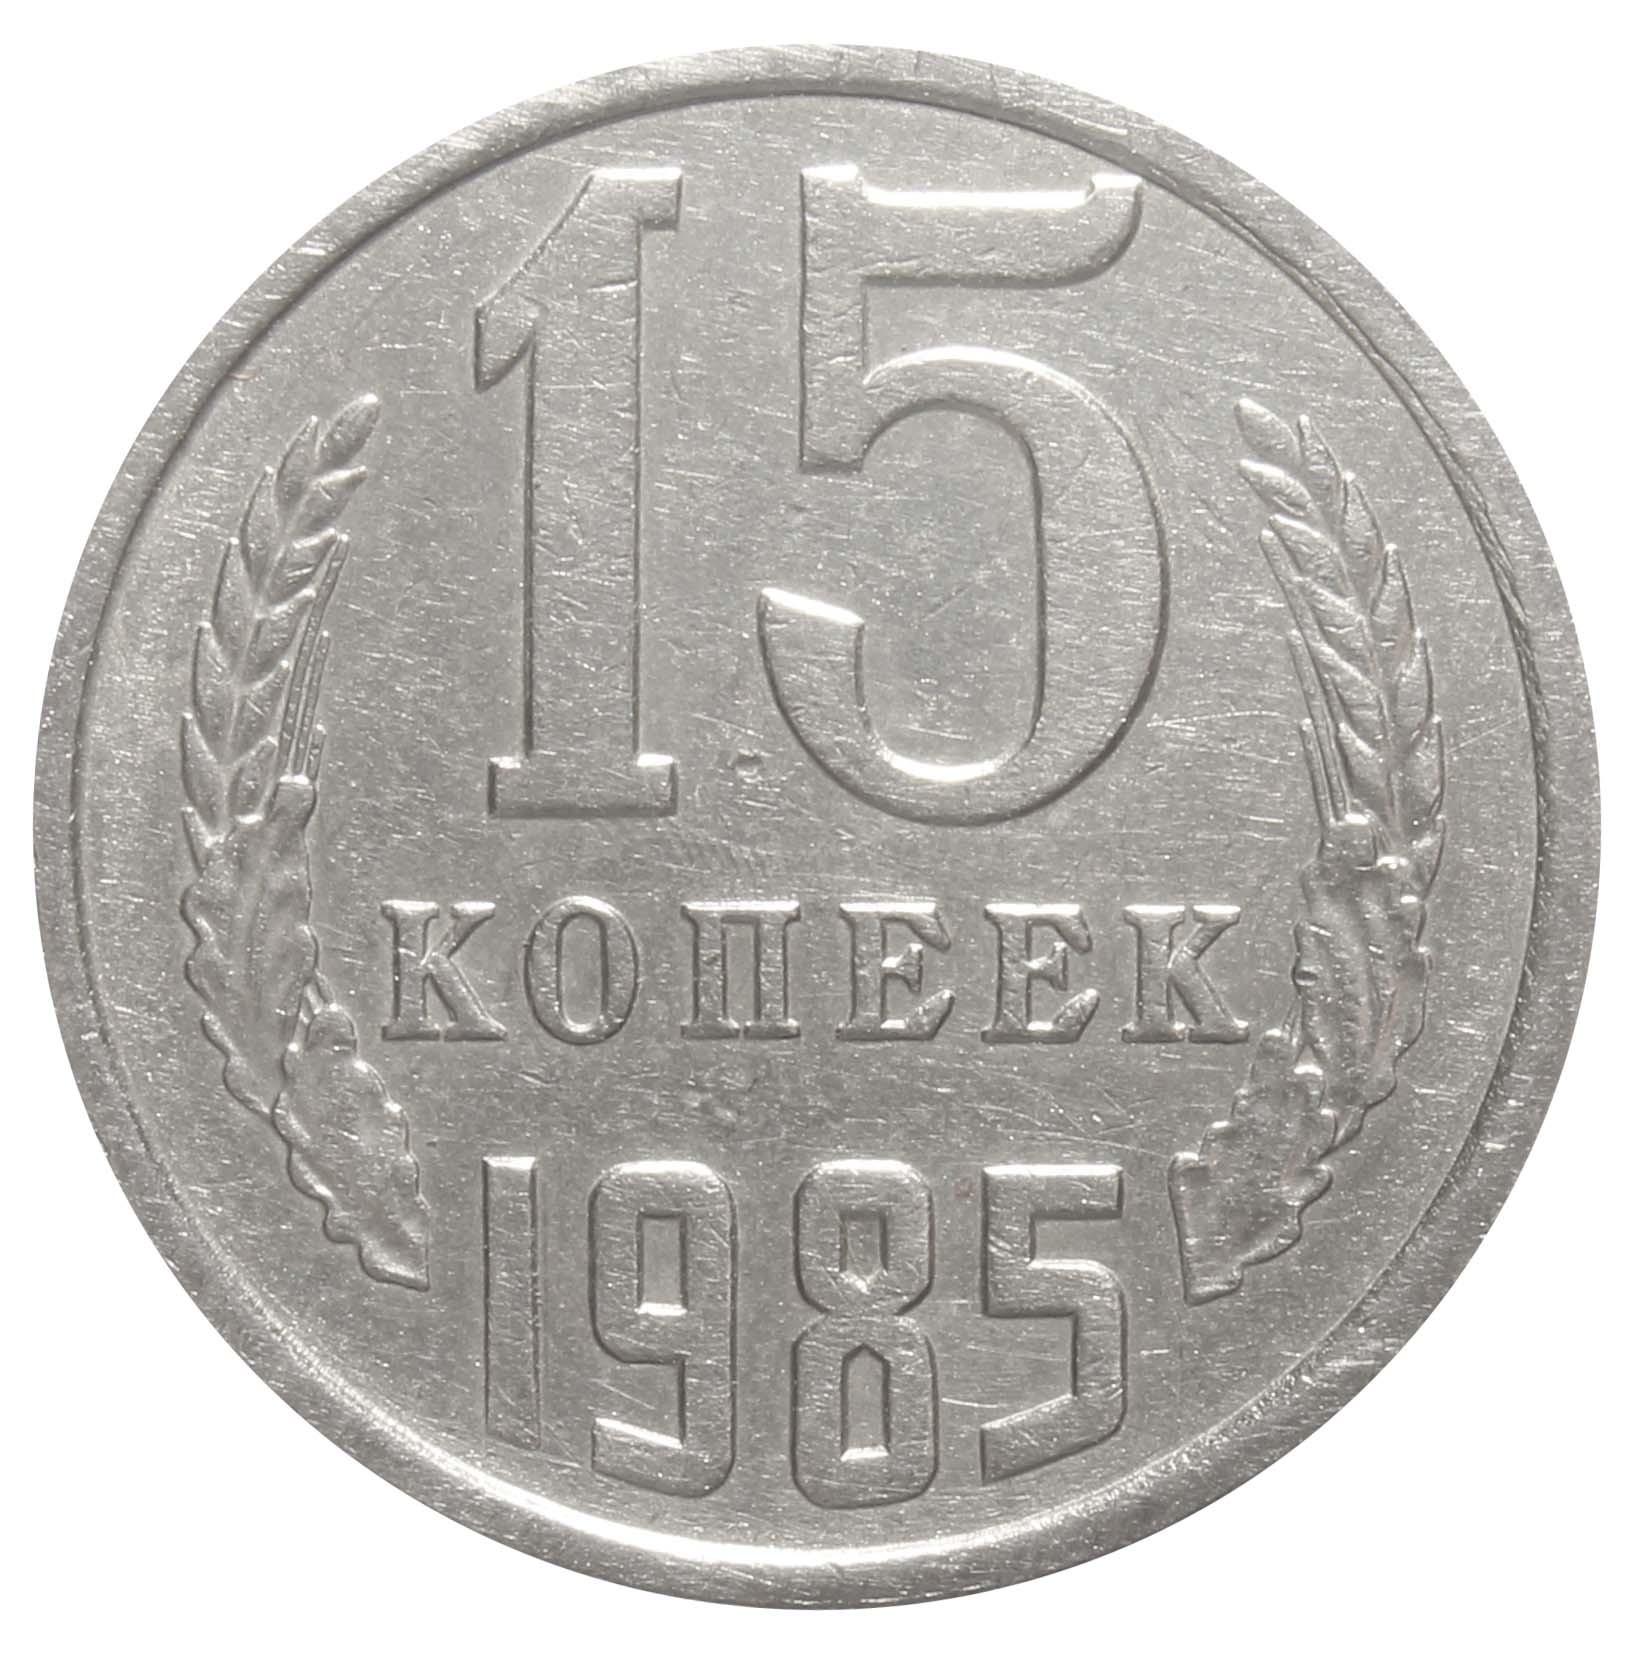 15 копеек 1985 года.  XF-